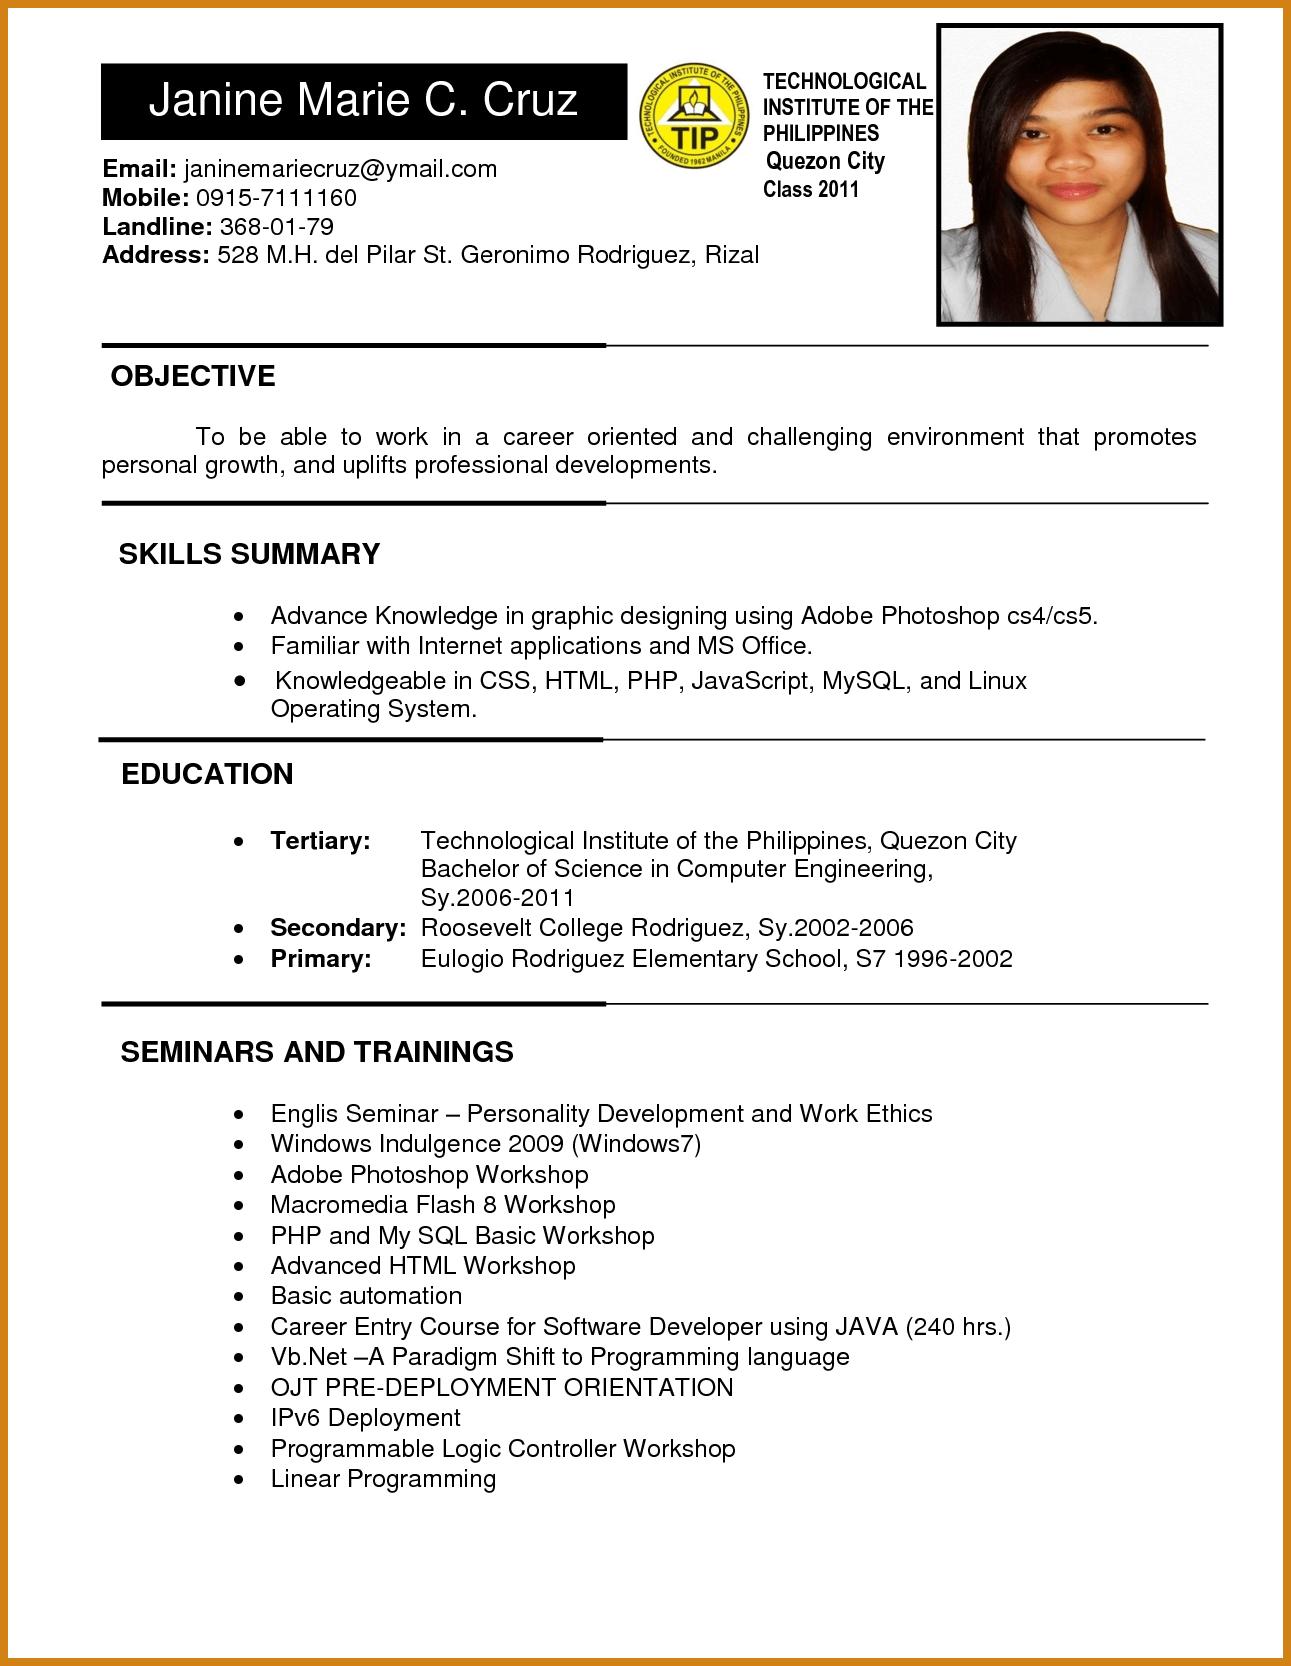 Resume Format For Job - Resume Templates